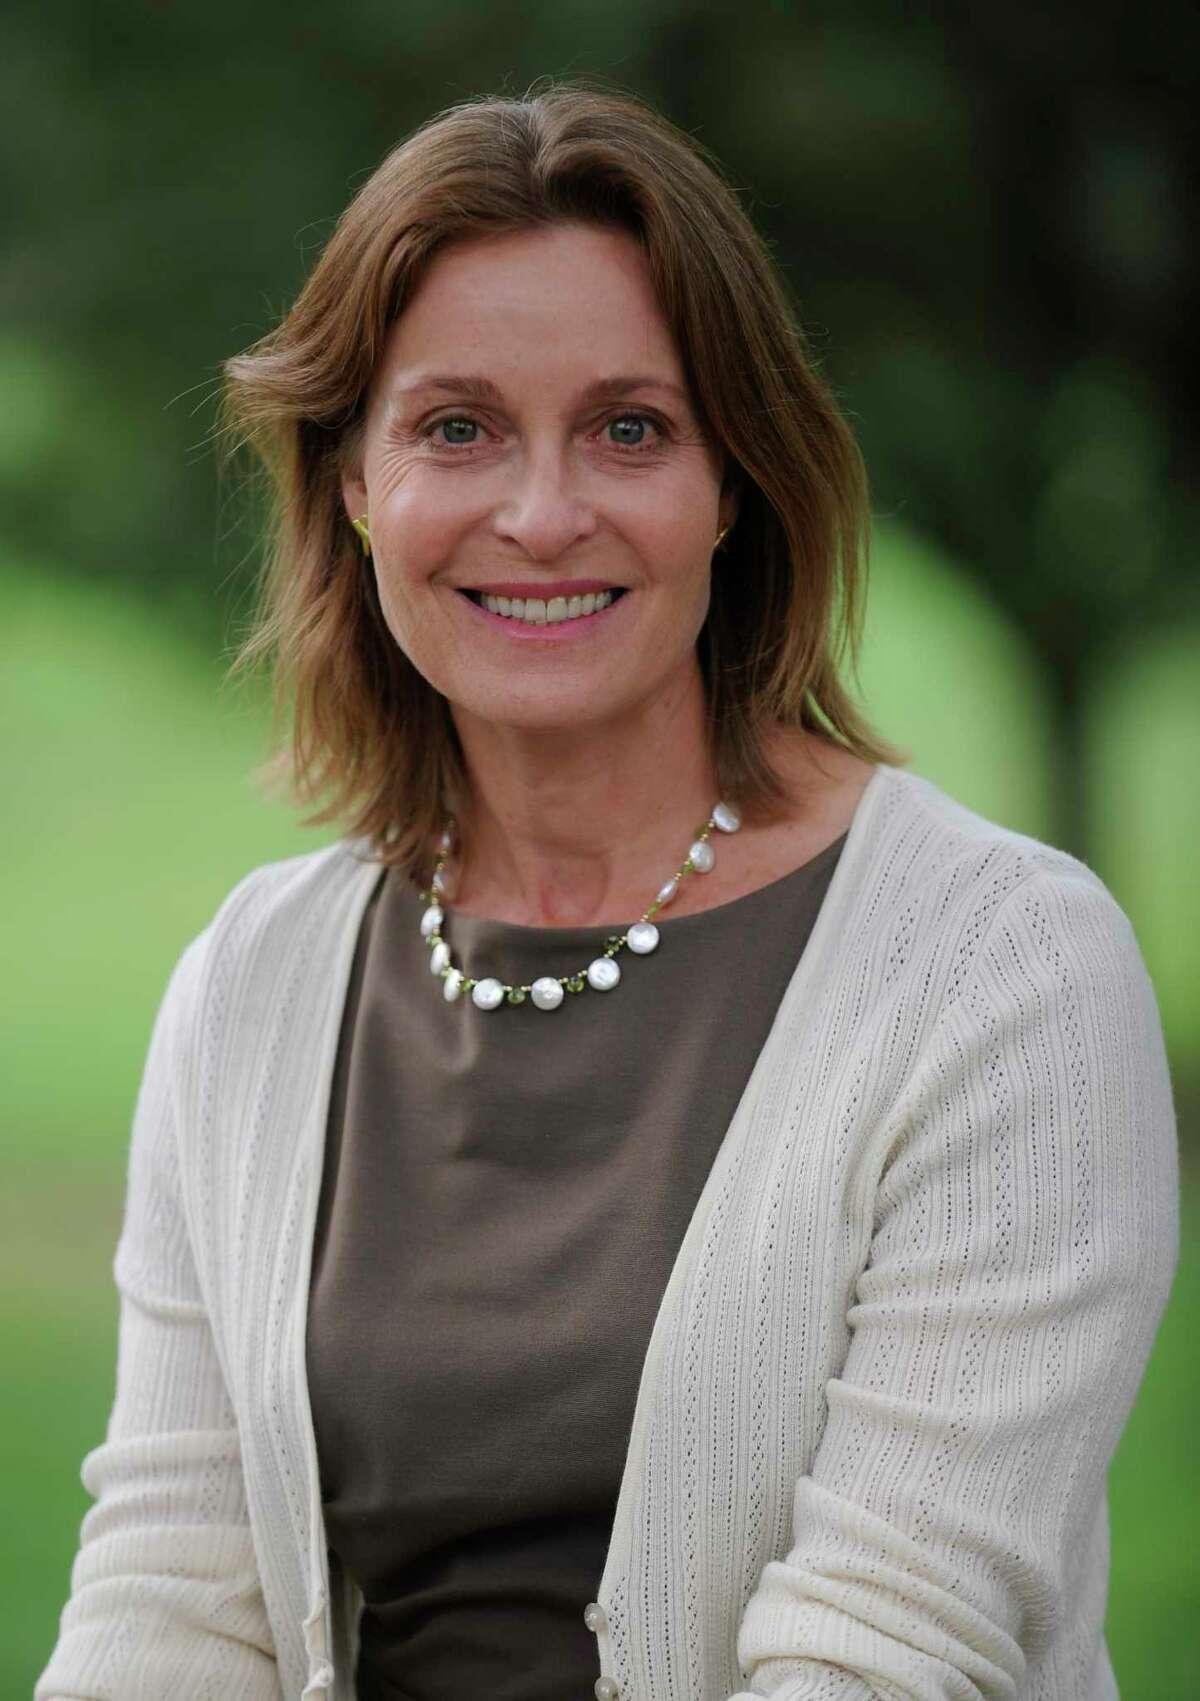 Jill Oberlander was recently elected to the Greenwich Board of Selectman.